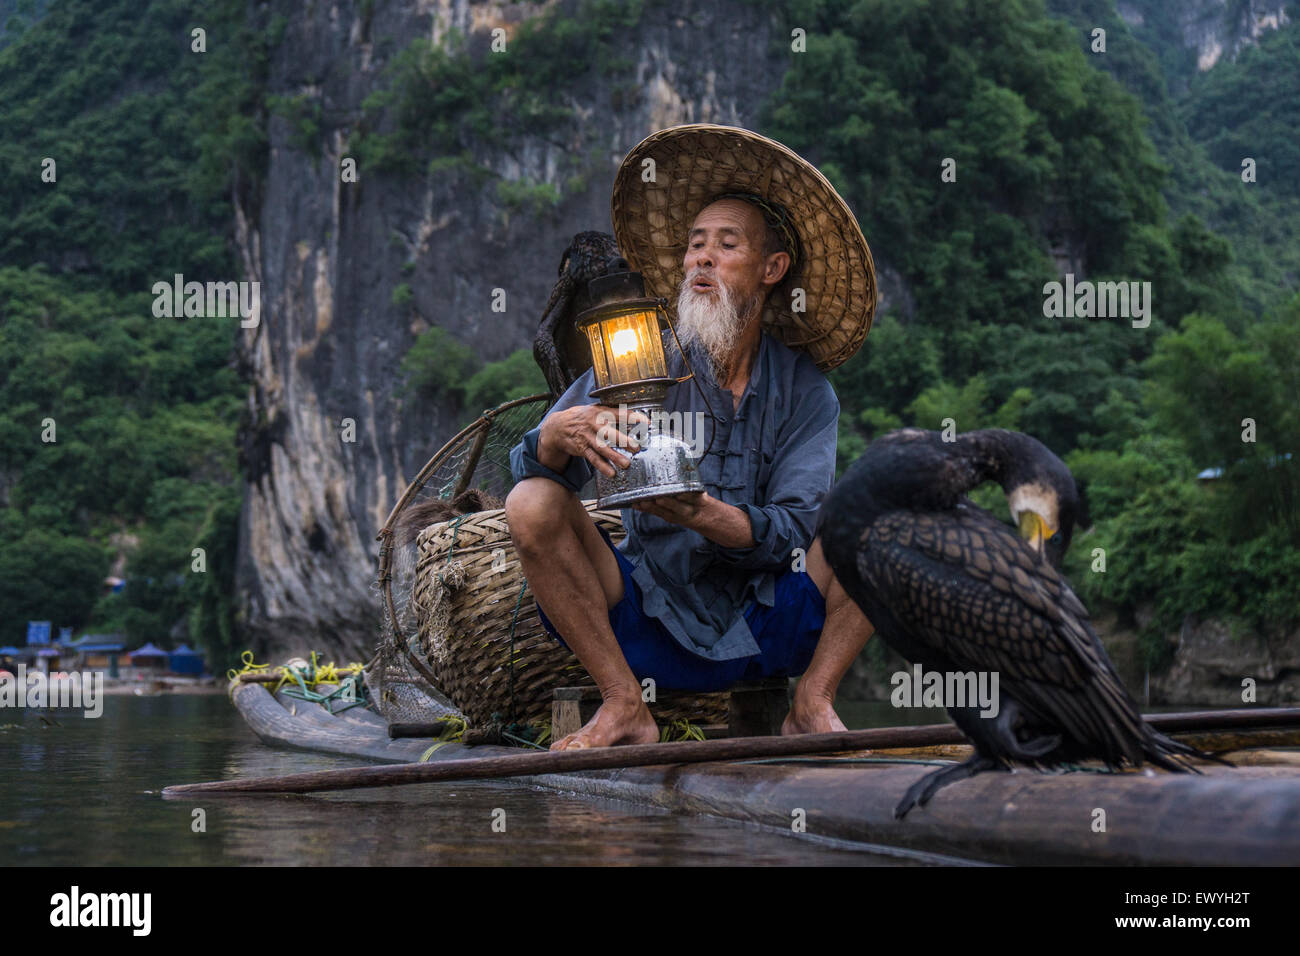 Cormorant fisherman on a raft holding a lantern, Guilin, China - Stock Image